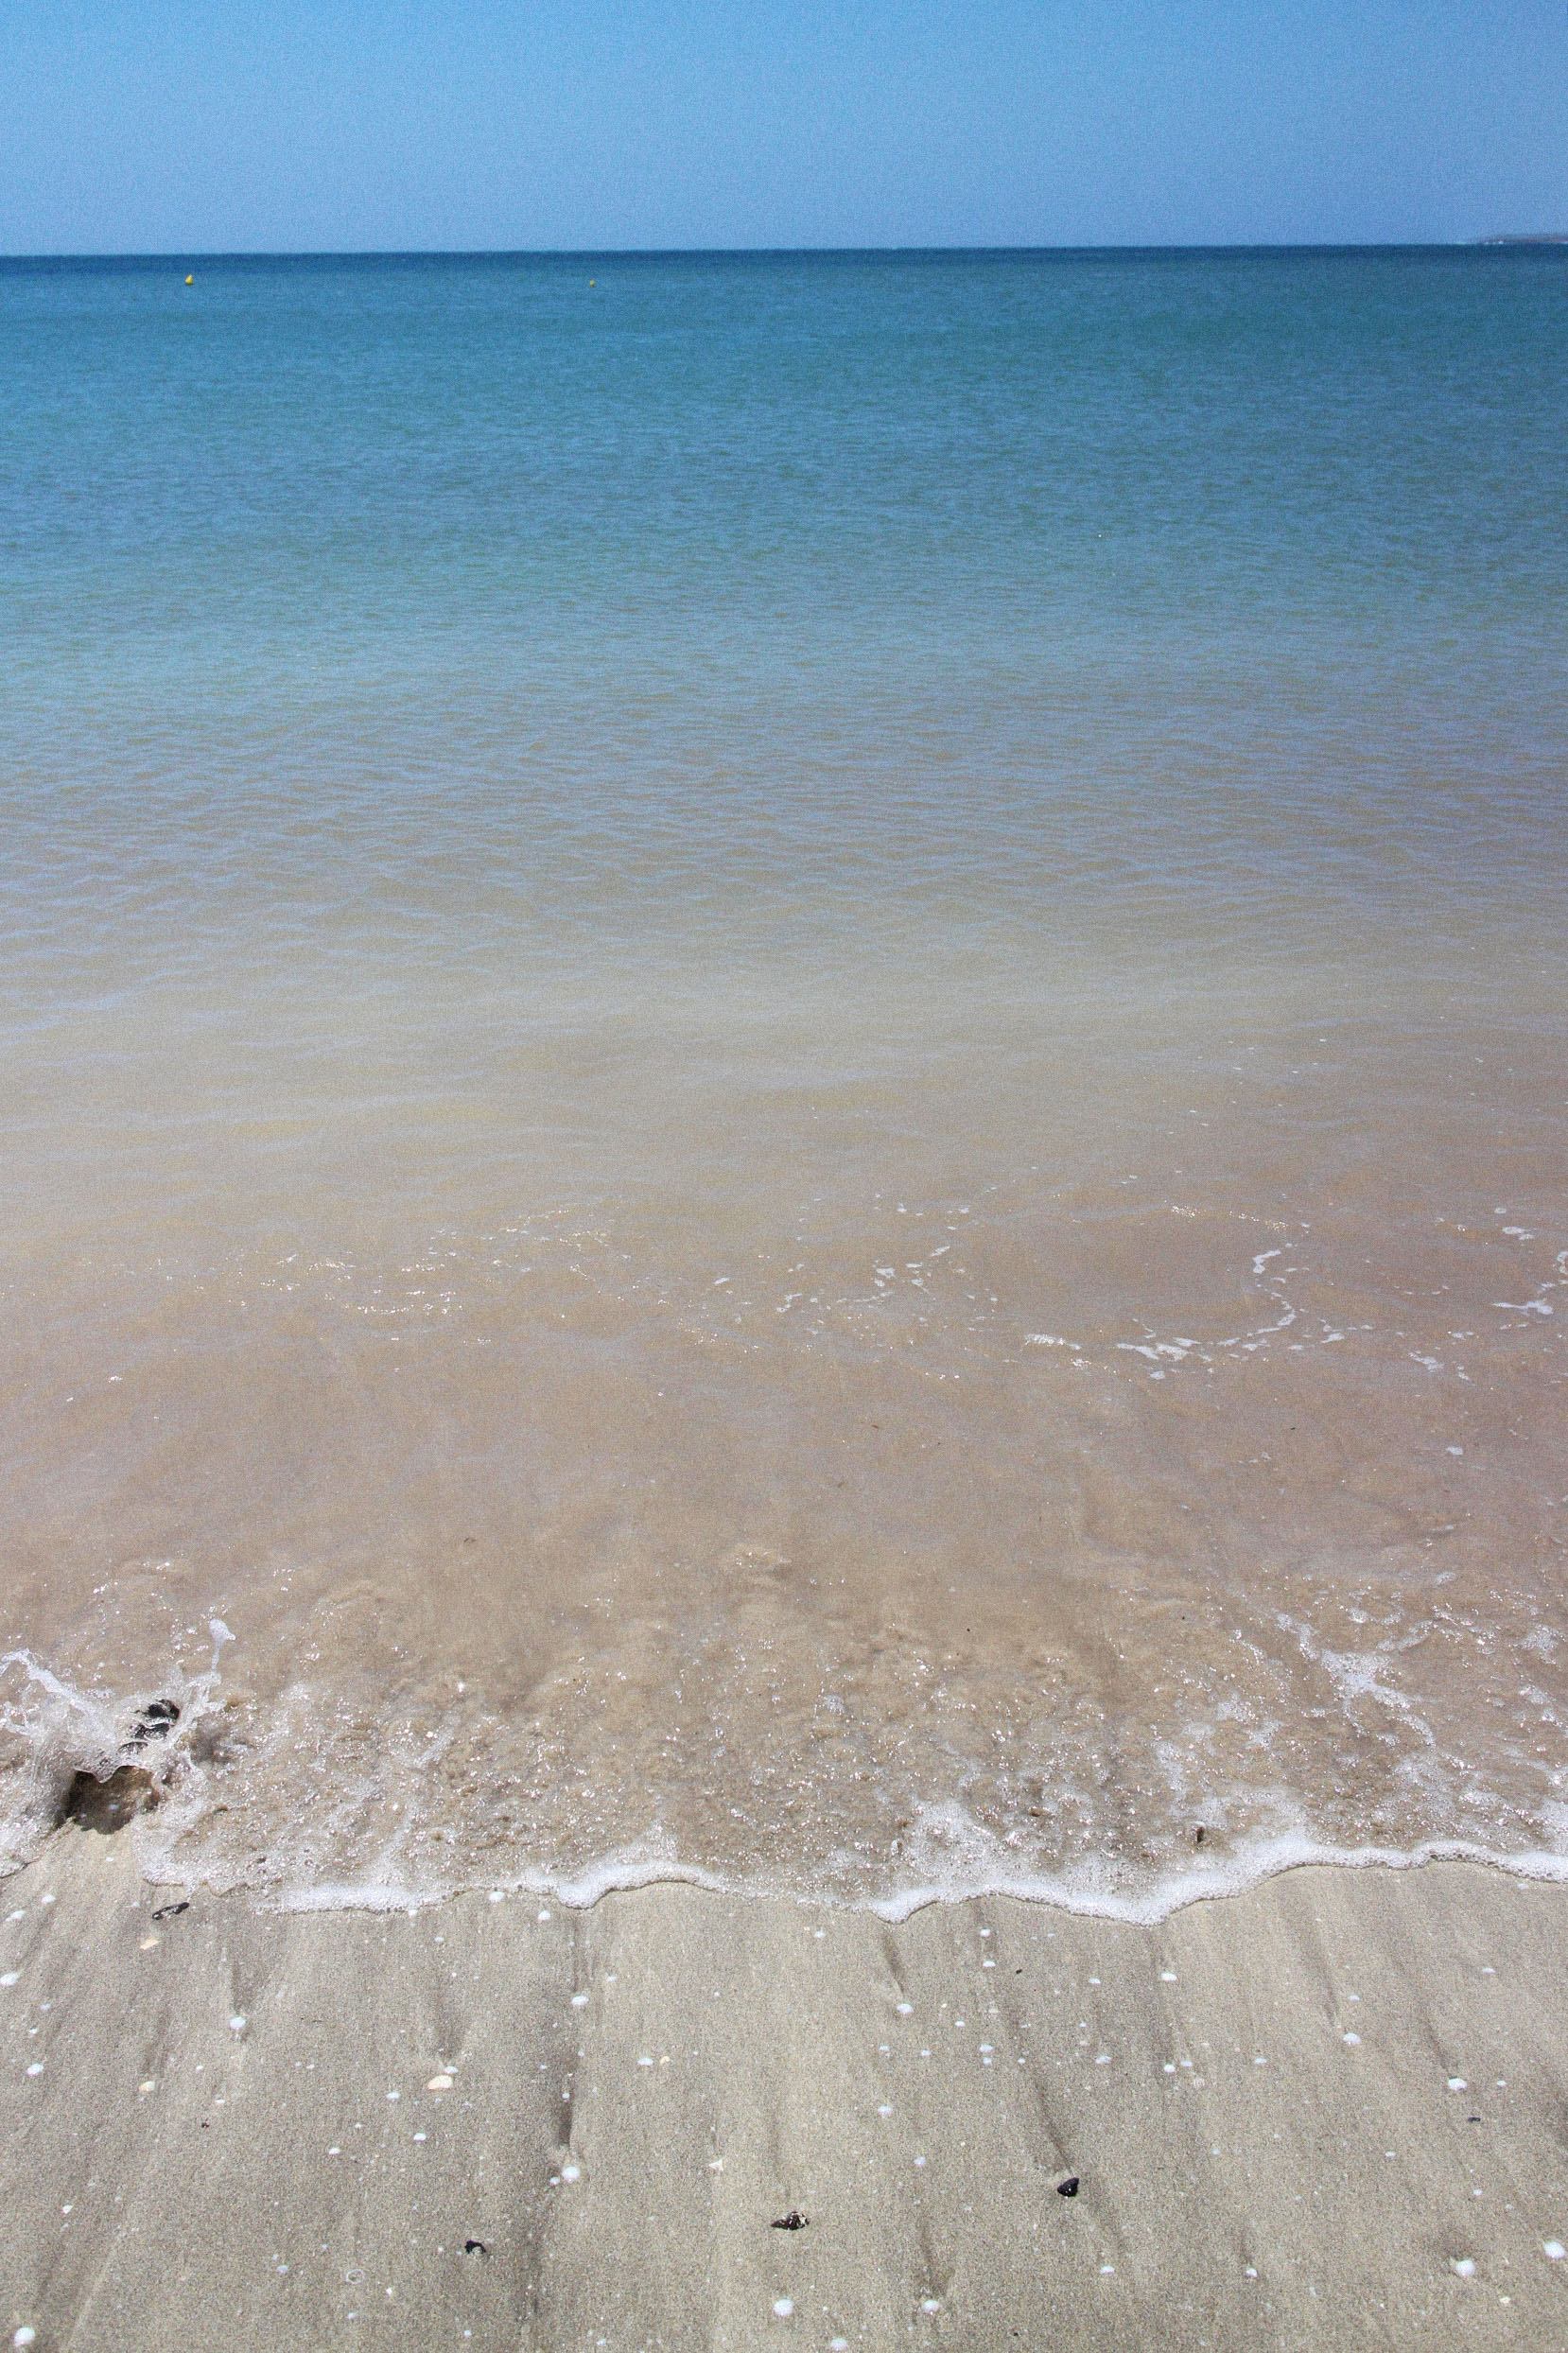 IHEARTALICE_Fuerteventura_08